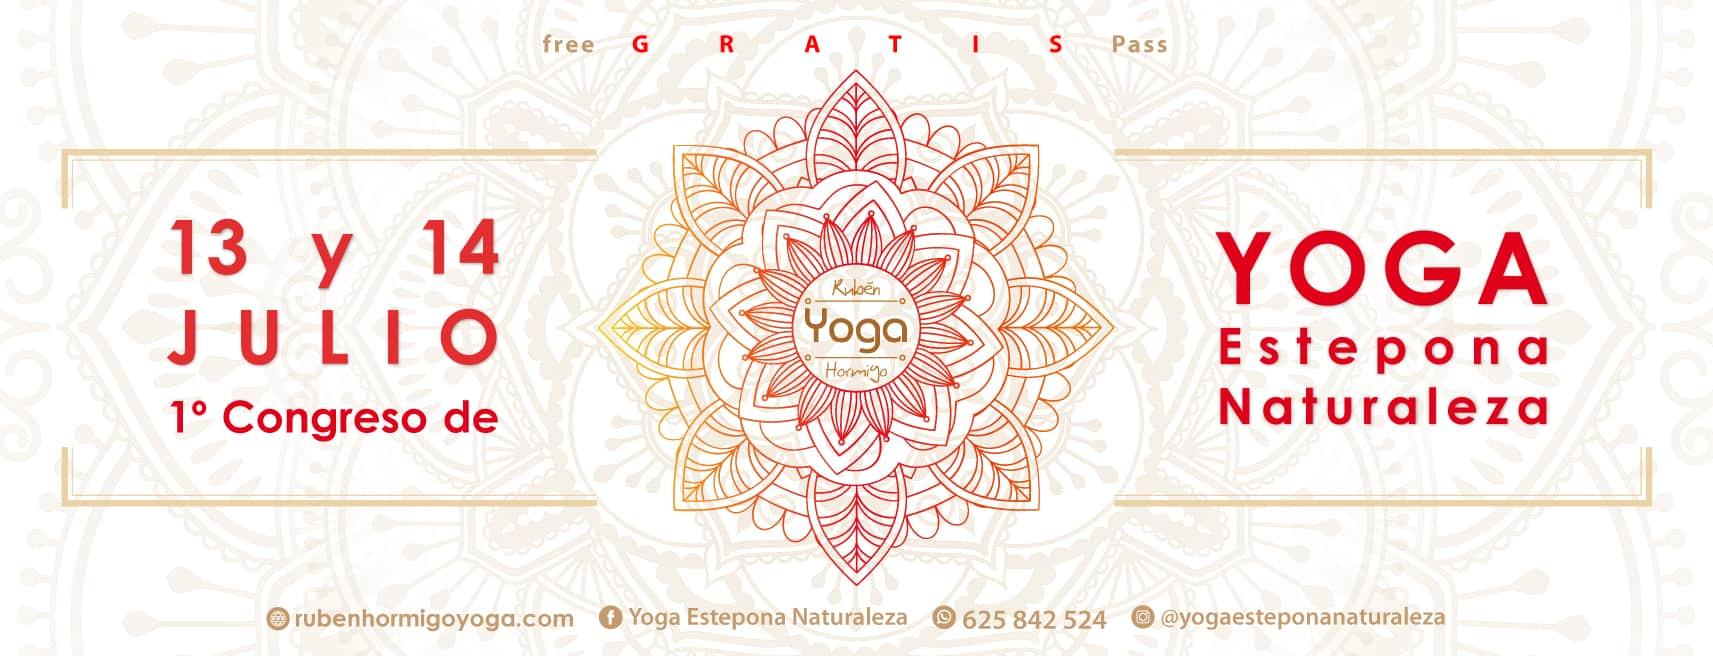 1 congreso de #yogaesteponanaturaleza